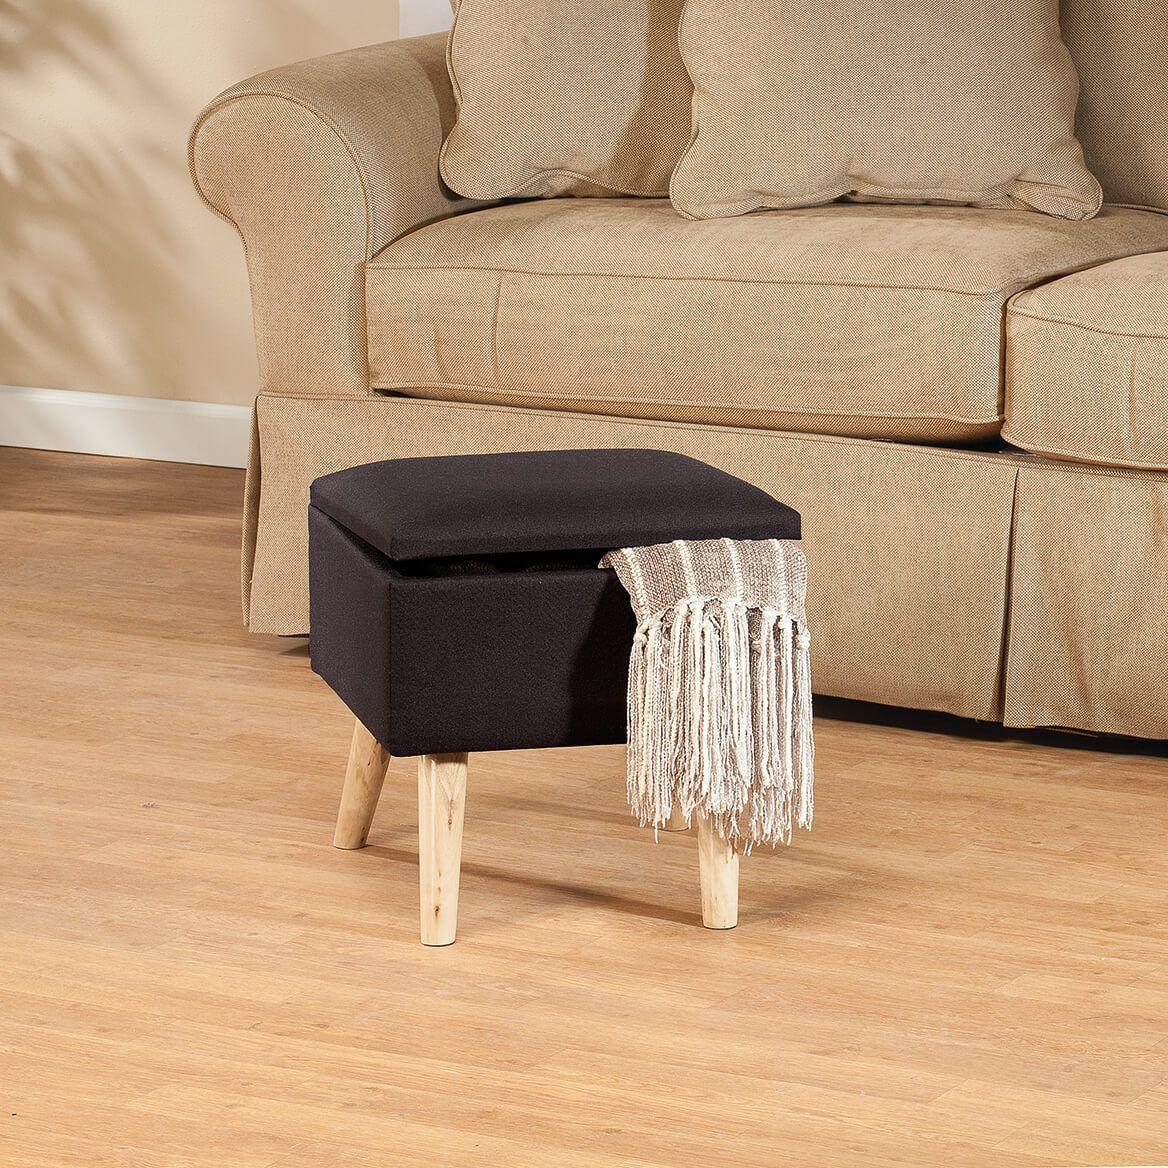 OakRidge™ Square Footstool Storage Ottoman-368765